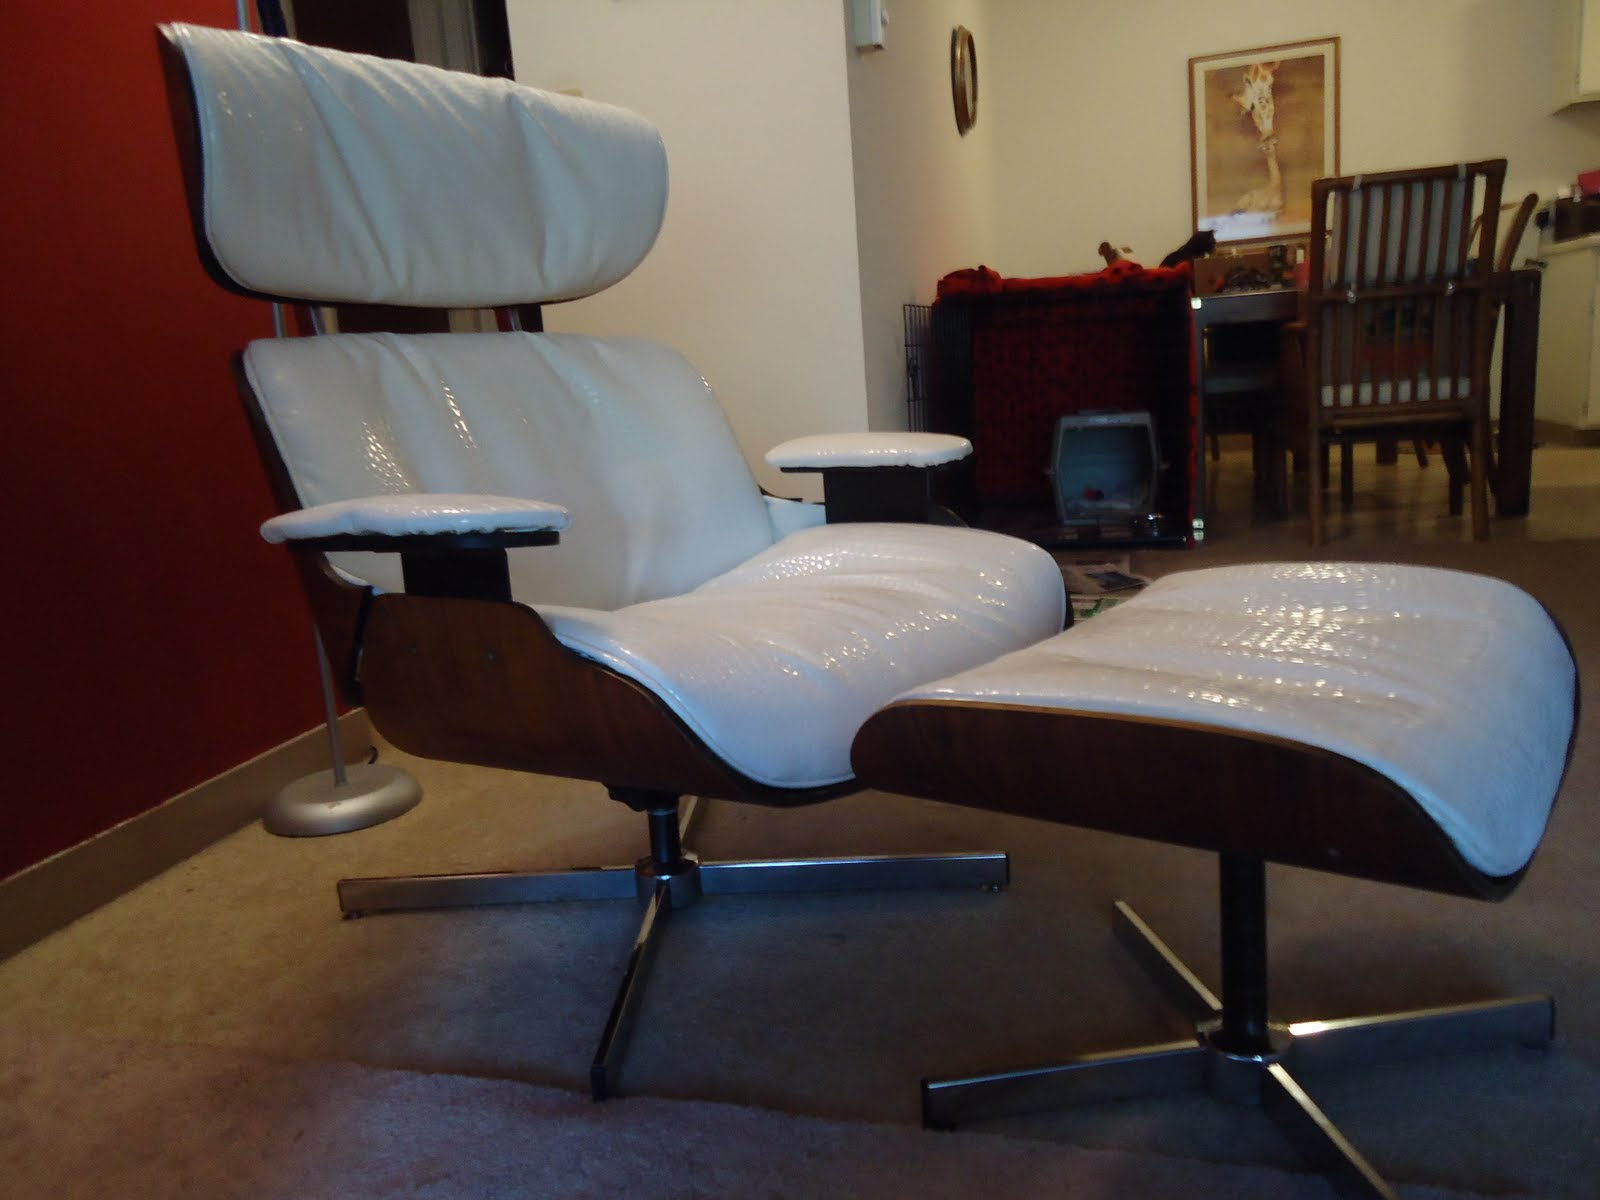 Herman Miller Eames Chair Parts Eames Lounge Chair Repair Parts